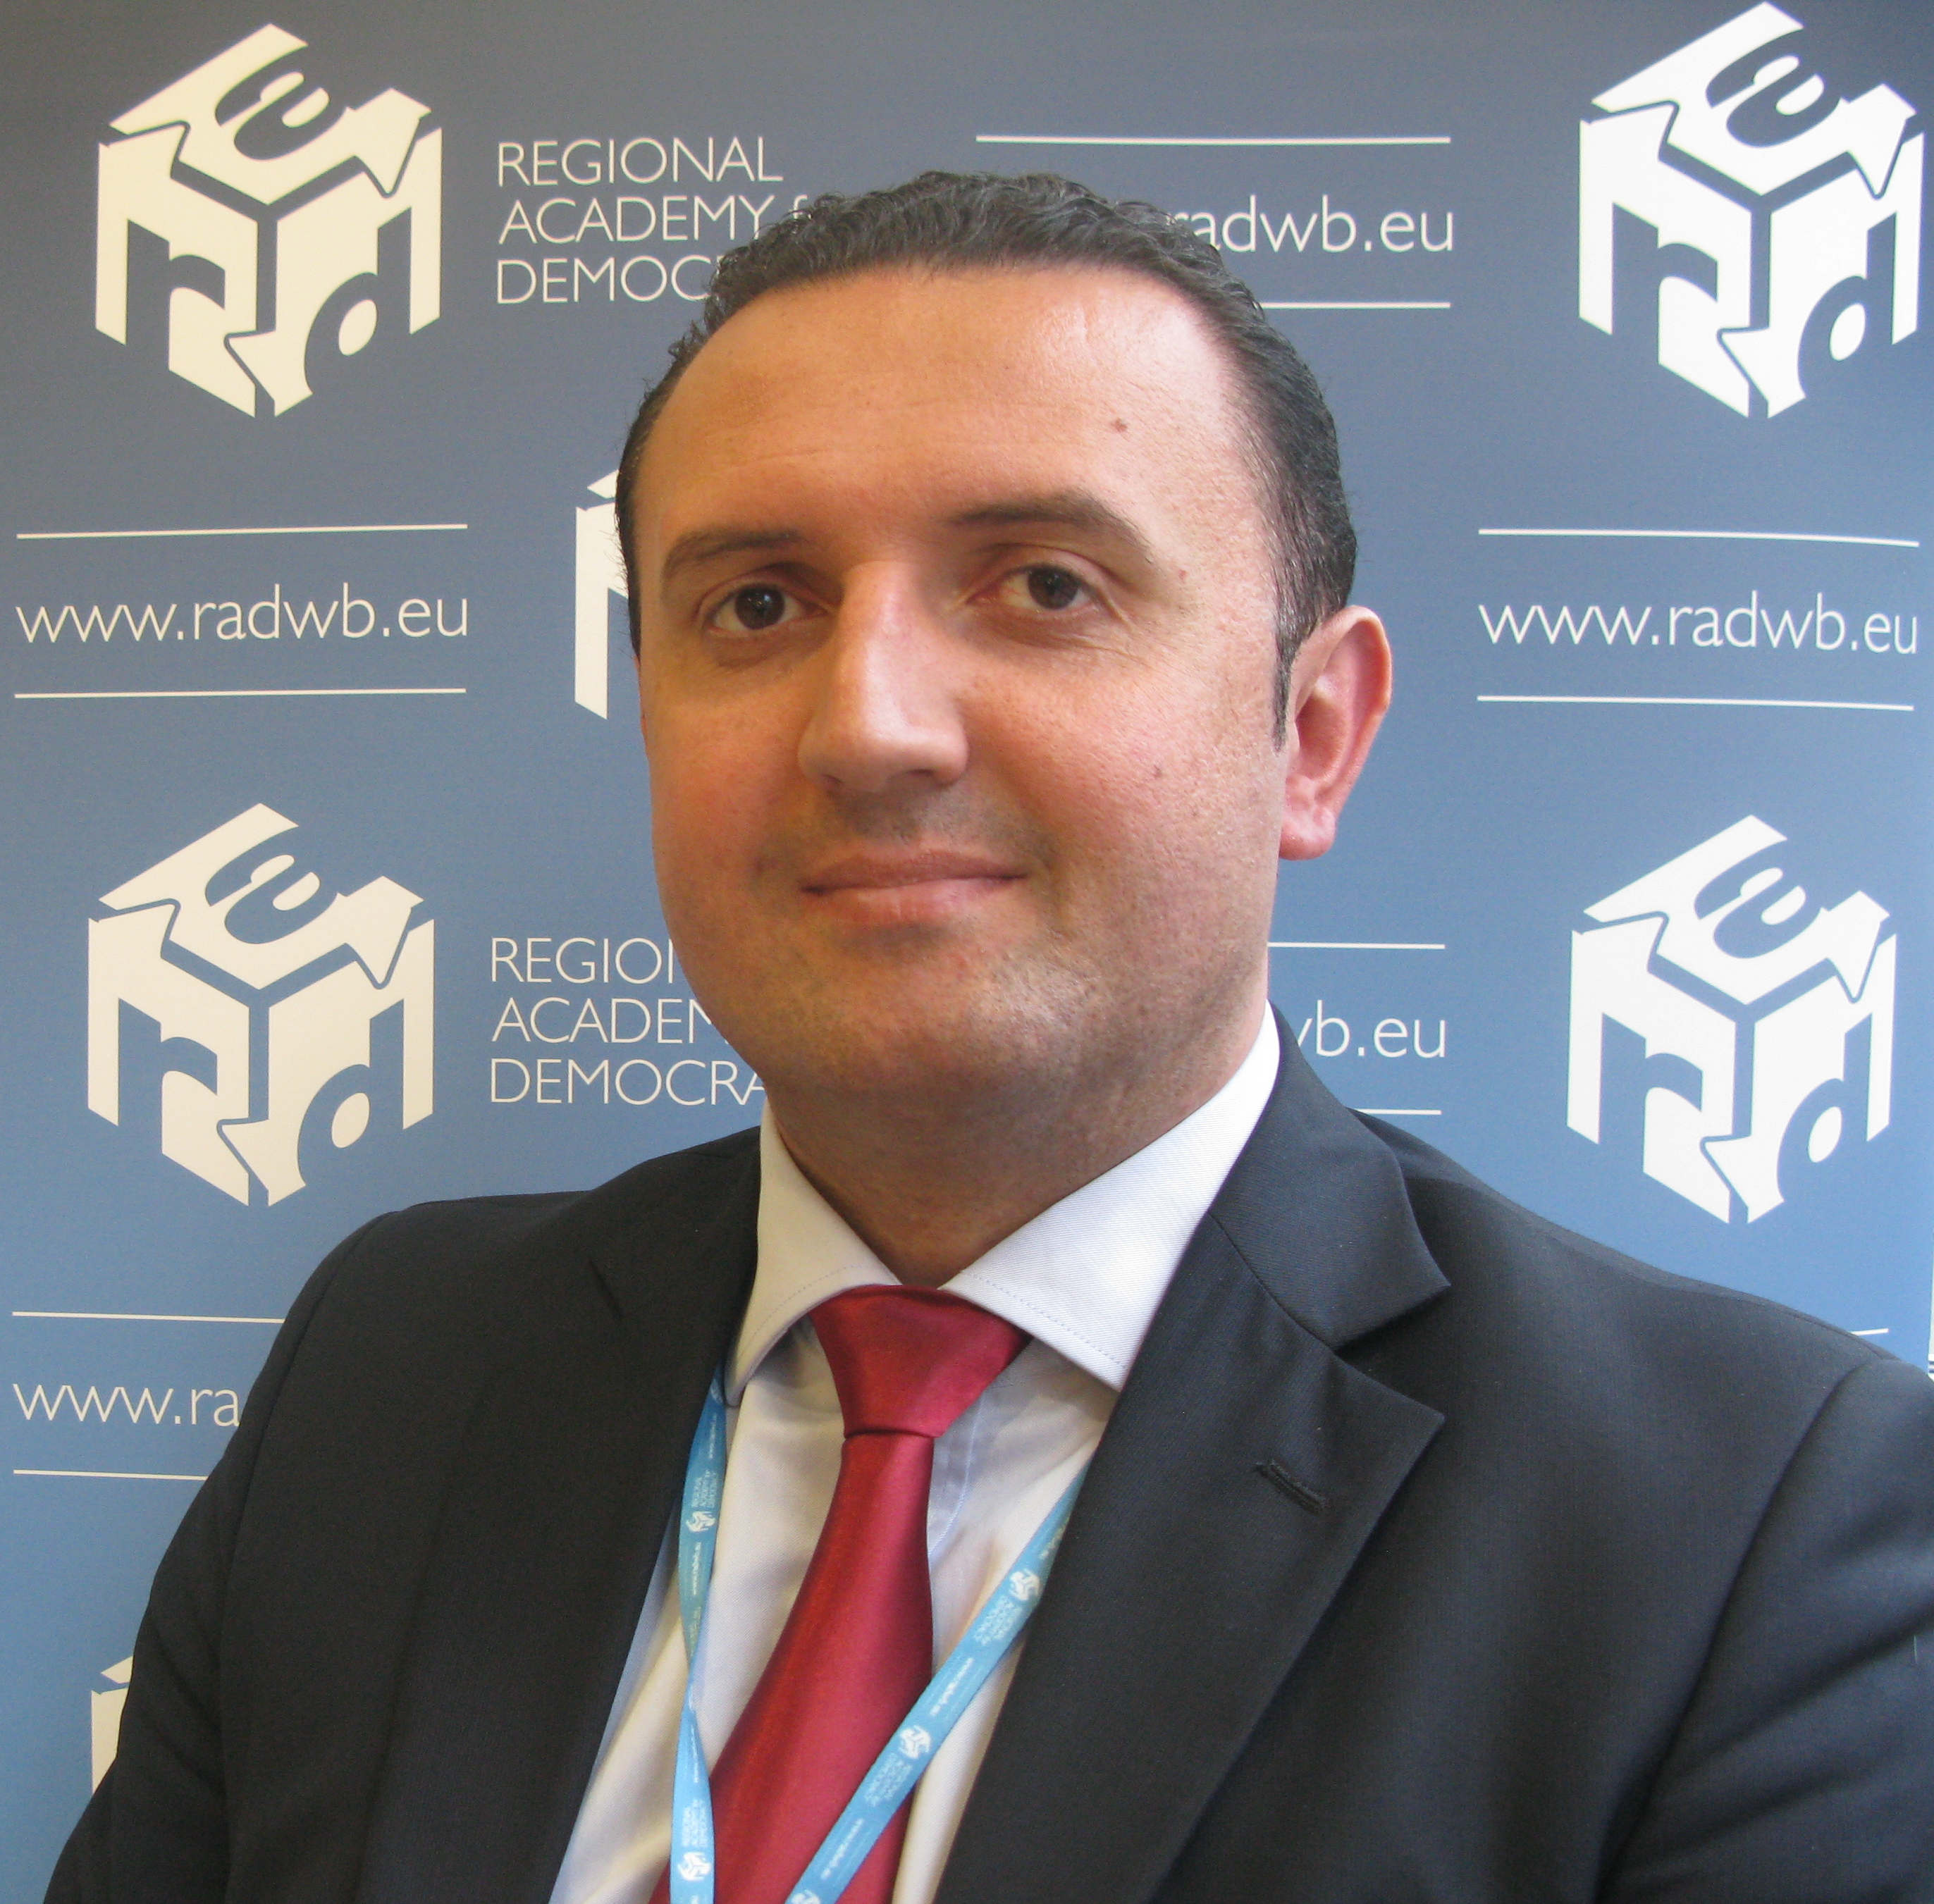 mr igor Igor kesaev on forbes retail magnate igor kesaev controls 70% of the russia's cigarette market through the megapolis subsidiary of his mercury company.